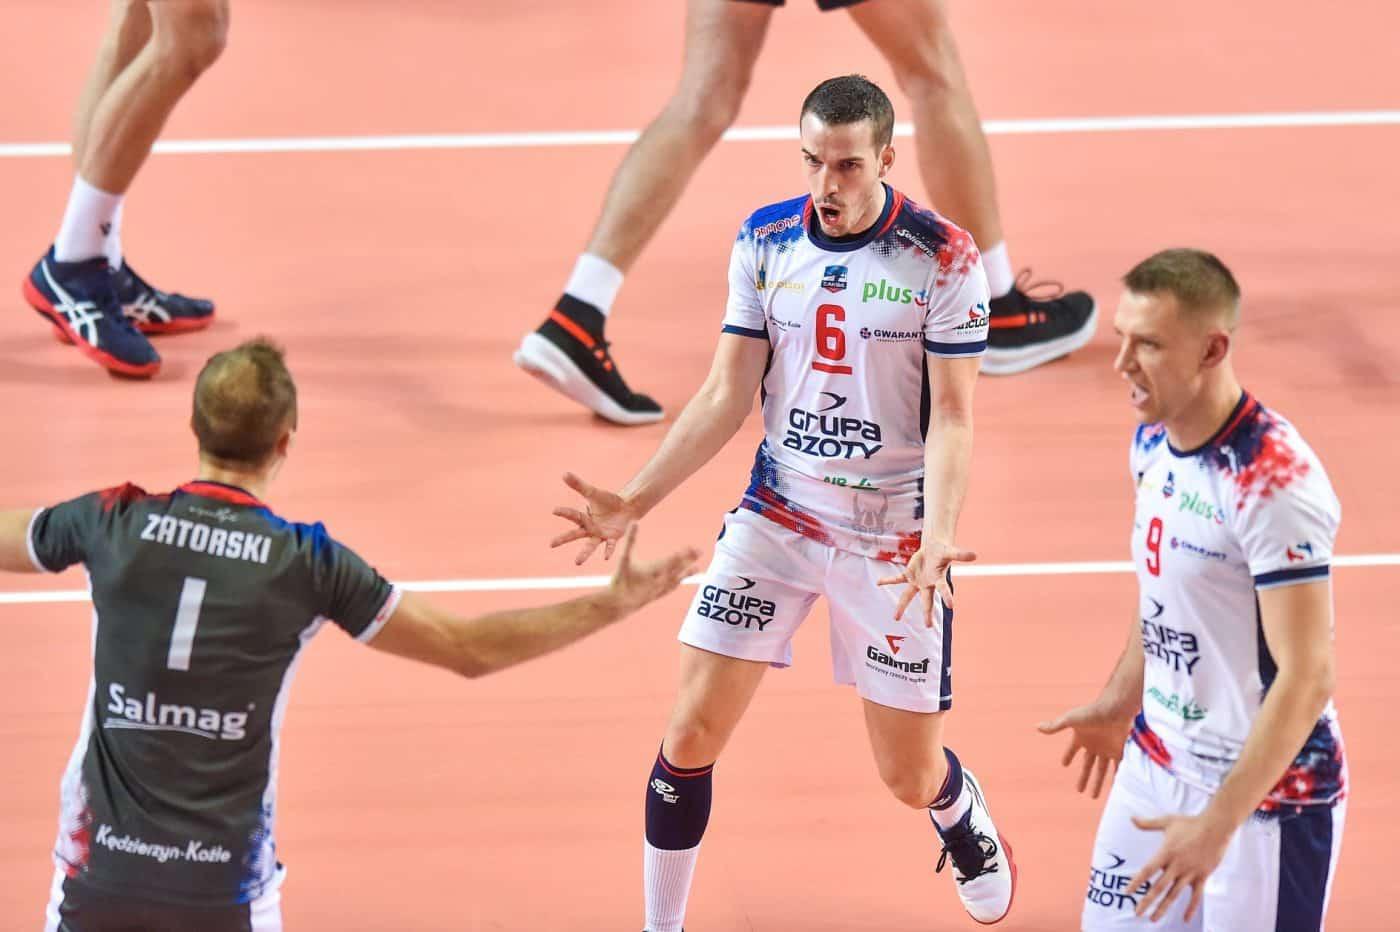 manchons-de-compression-bv-sport-volley-2